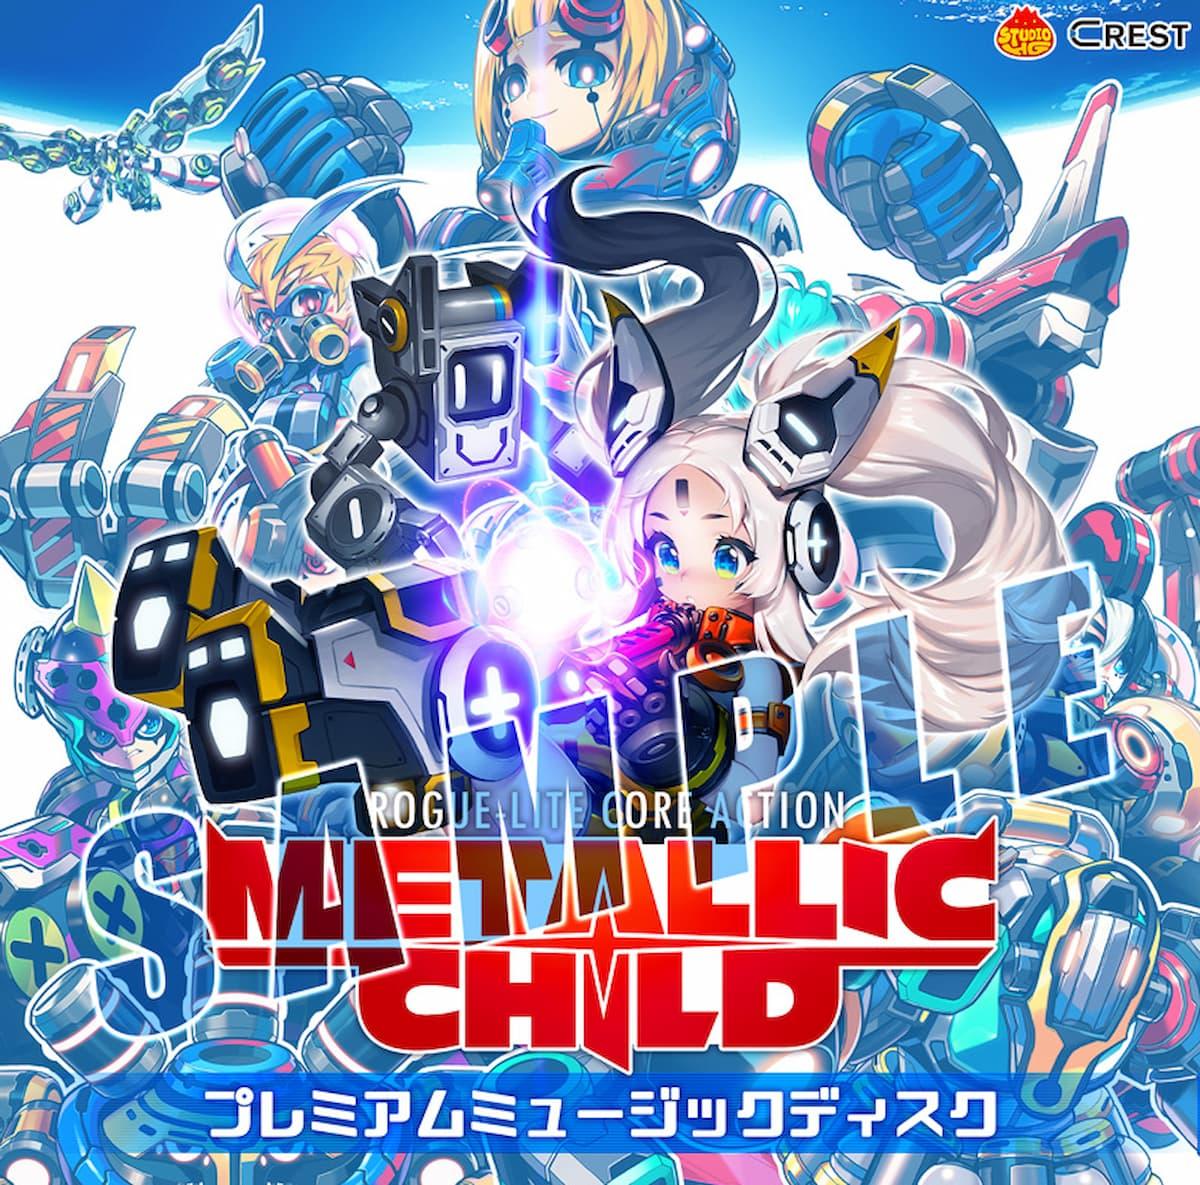 METALLIC CHILD プレミアムミュージックディスク